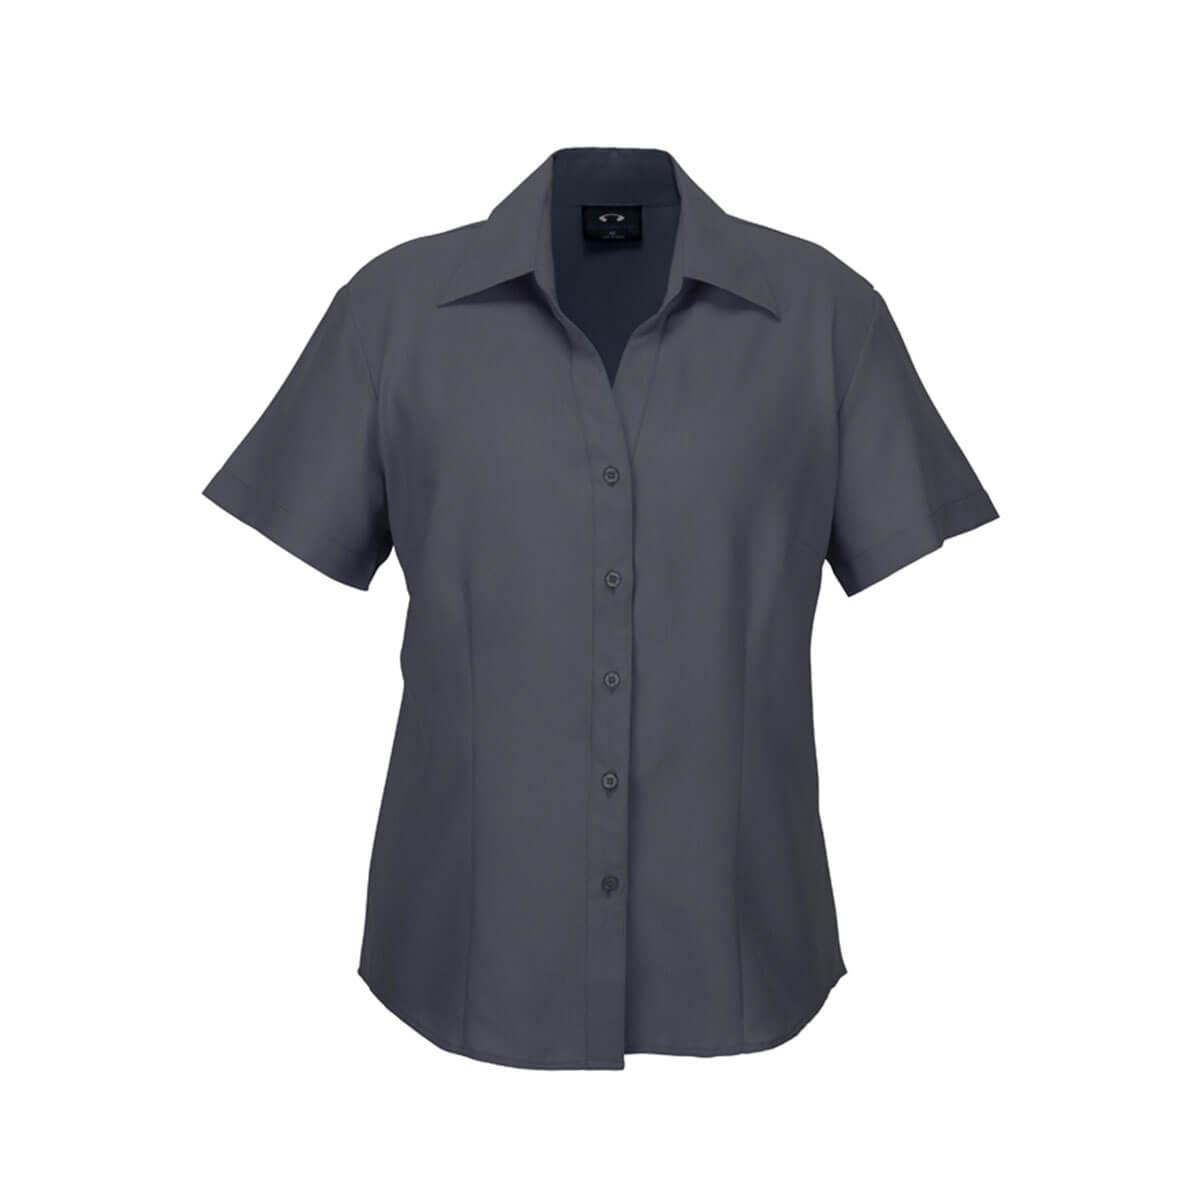 Ladies Plain Oasis Short Sleeve Shirt-Charcoal